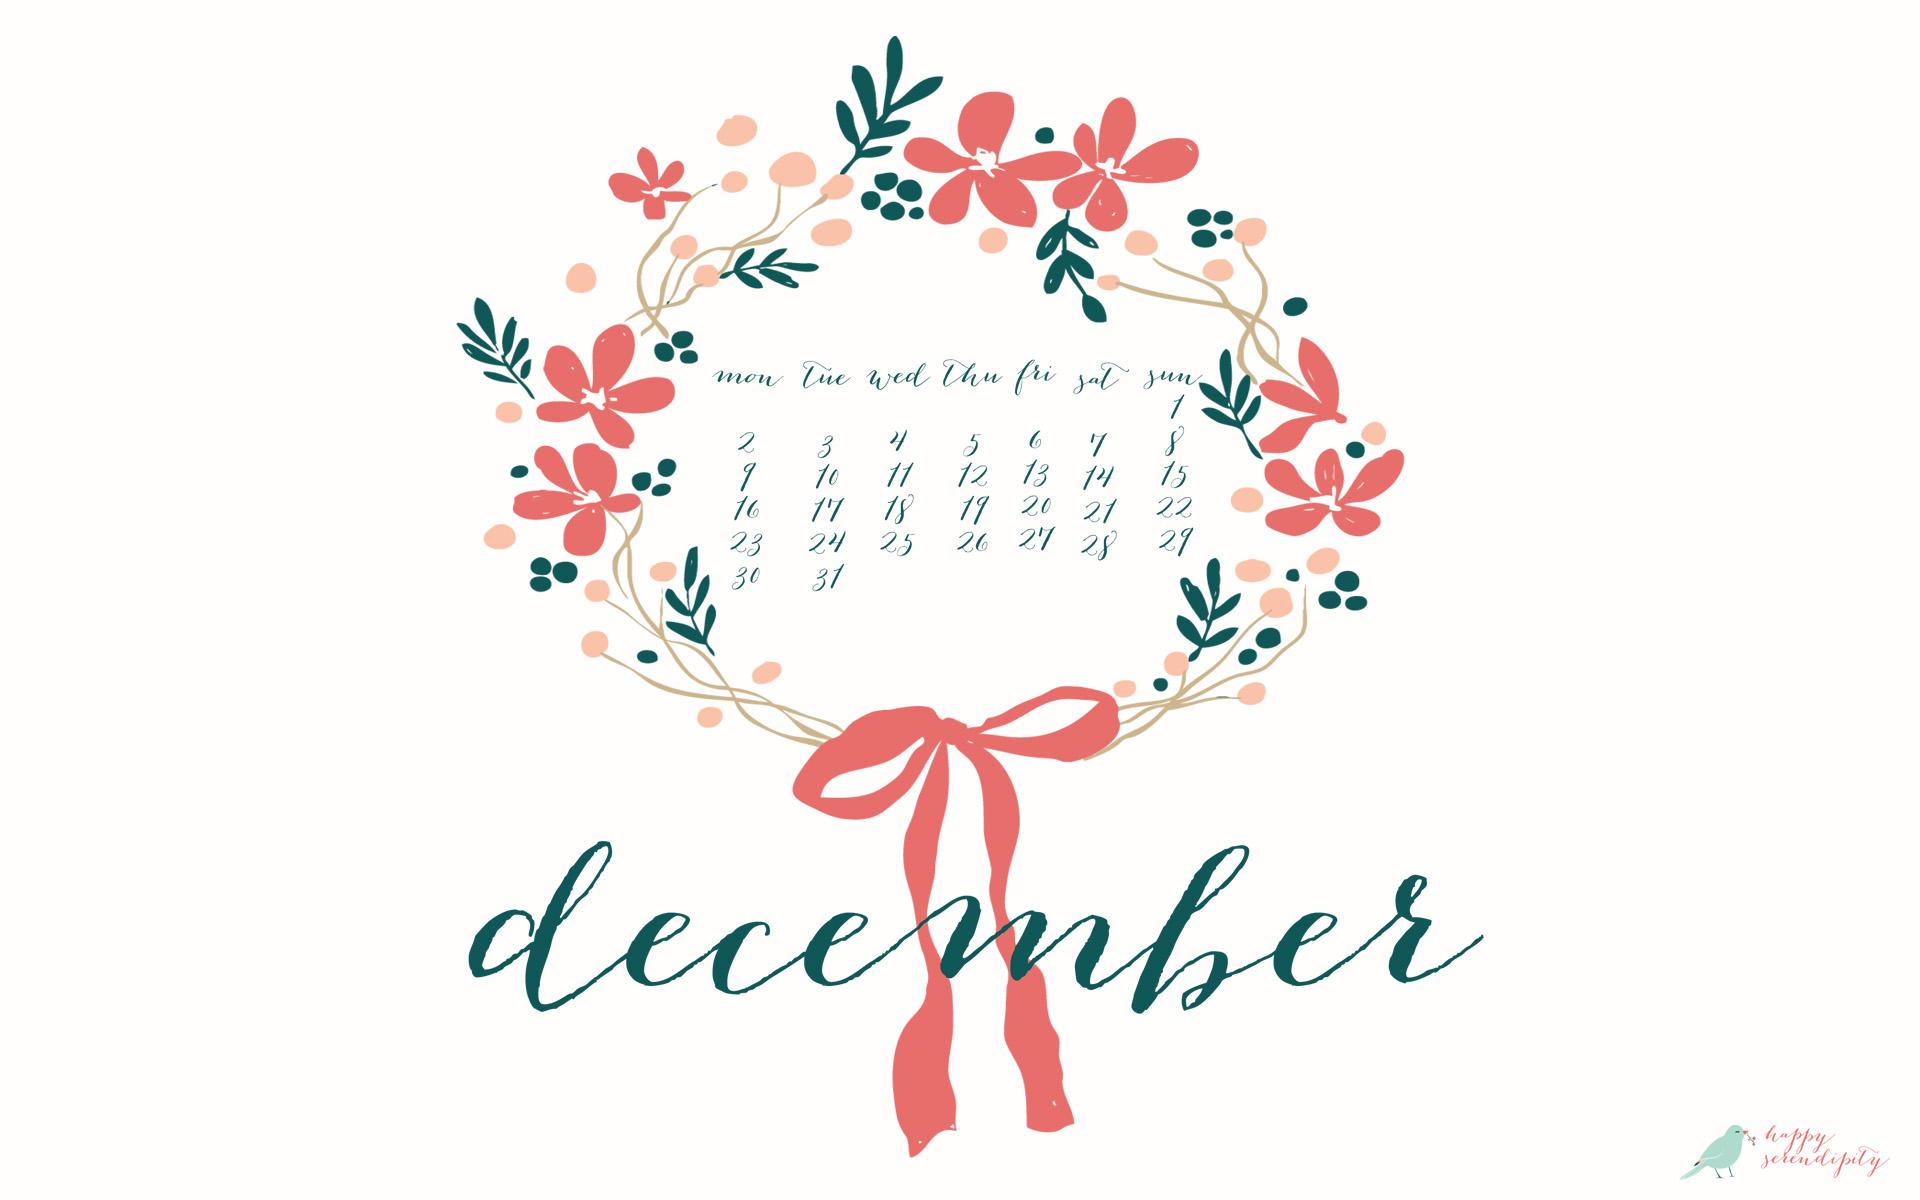 Free Desktop Wallpaper December 2013